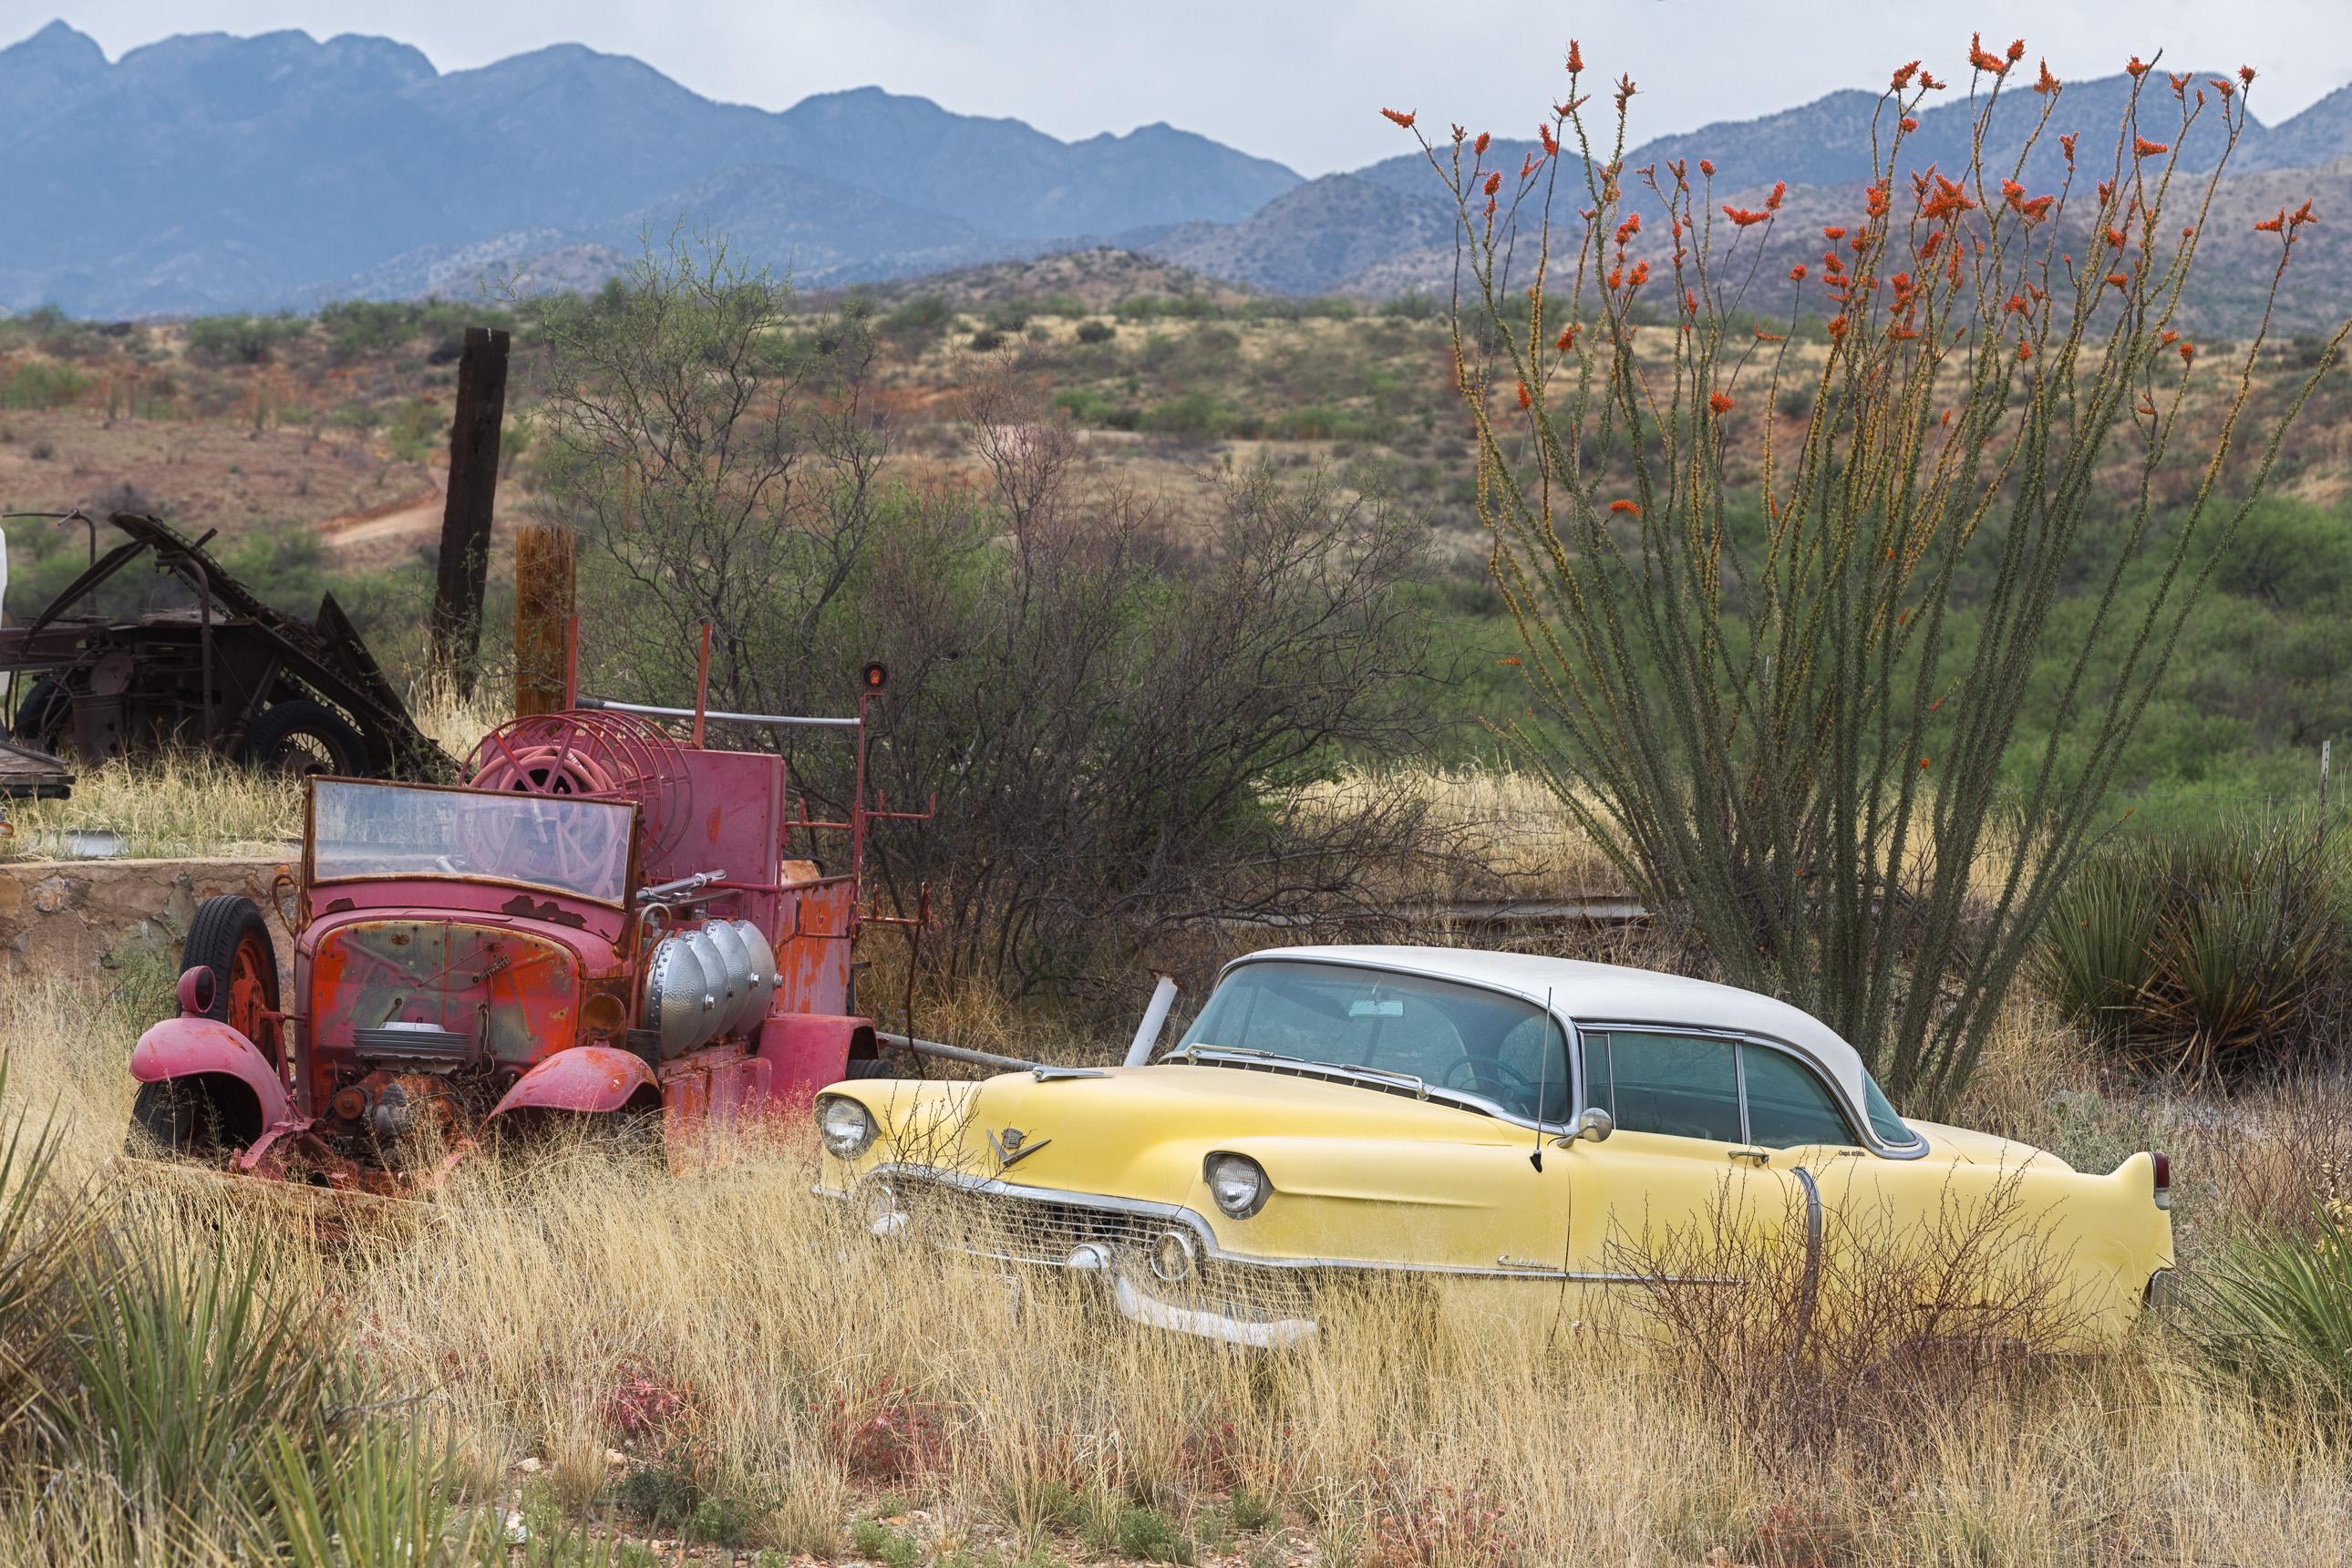 1954 Cadillac decaying on an Arizona farm